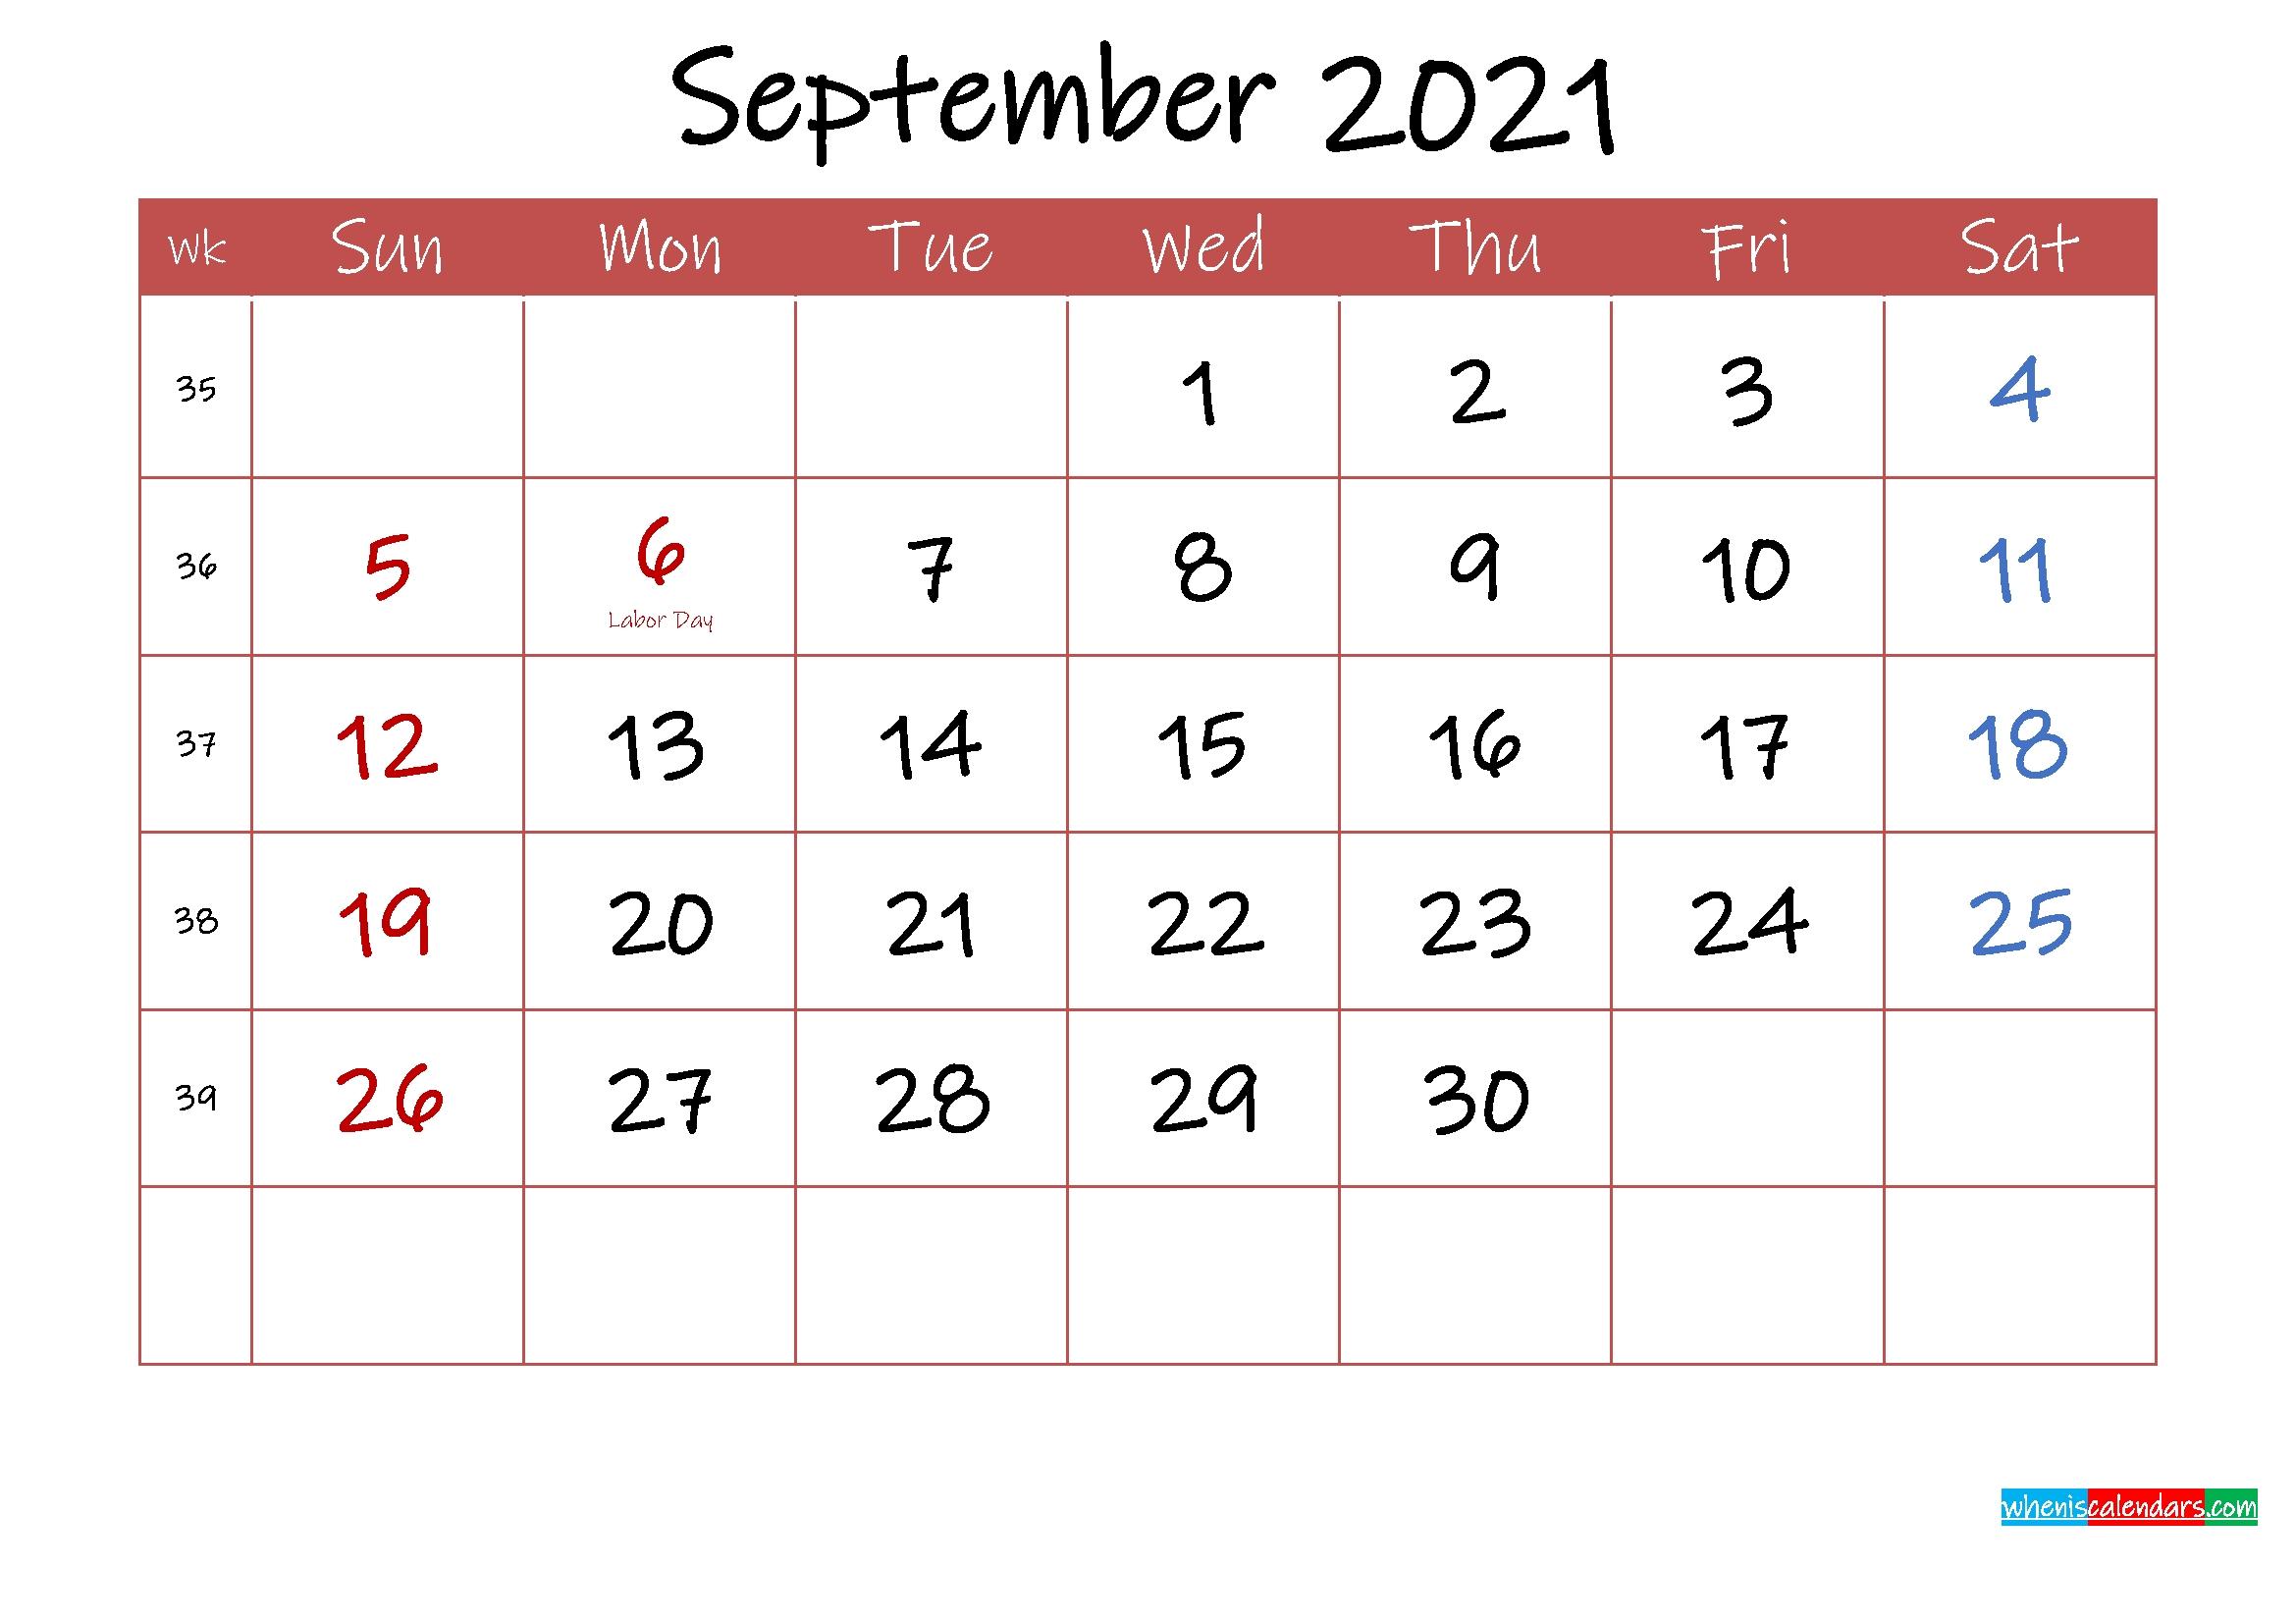 Printable September 2021 Calendar With Holidays - Template Ink21M33 - Free Printable 2021 2021 Calendar September Month